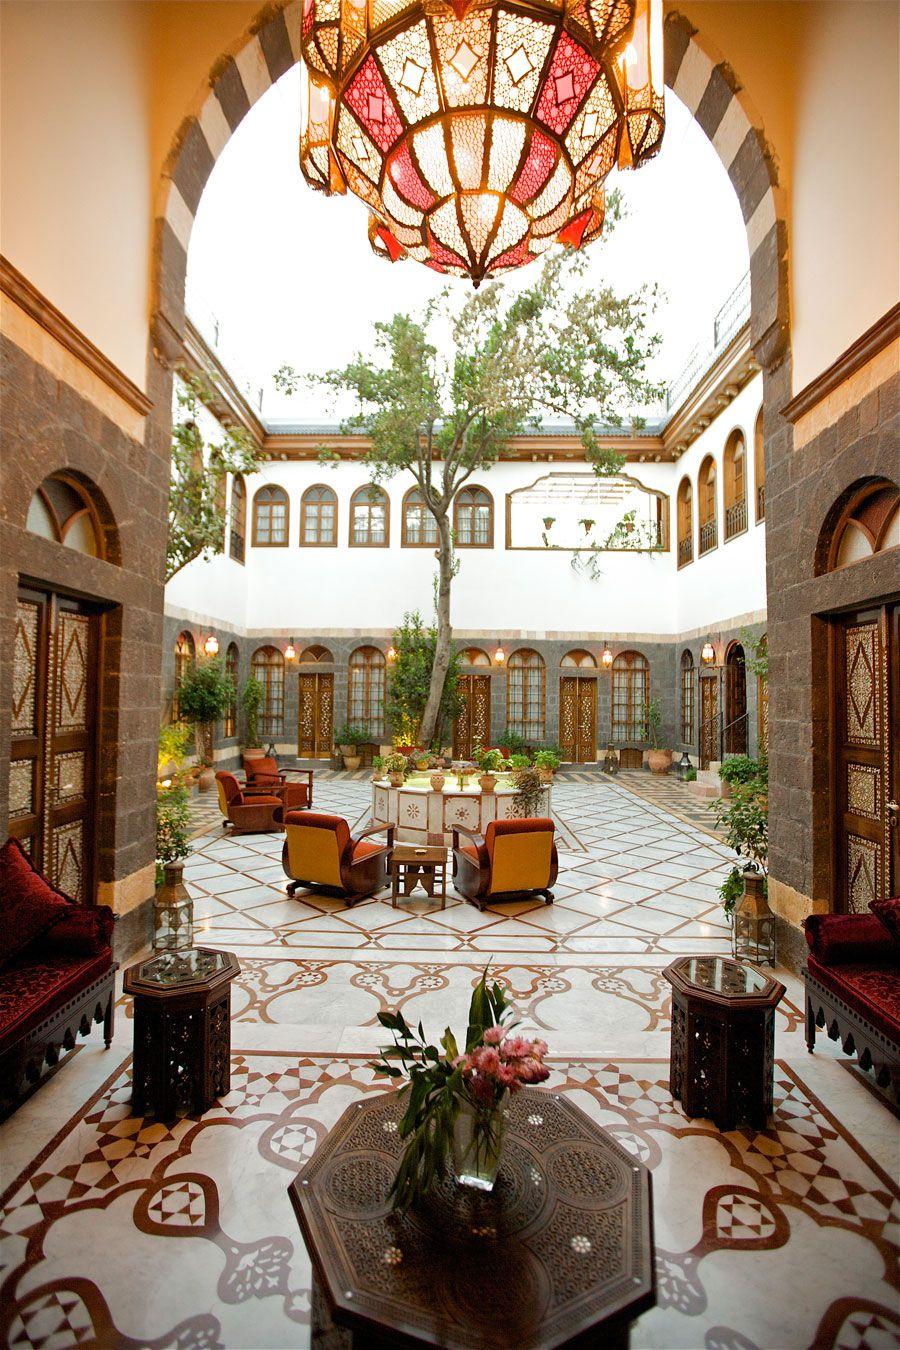 The Liwan Beit Zafran Hotel De Charme Damascus Syria